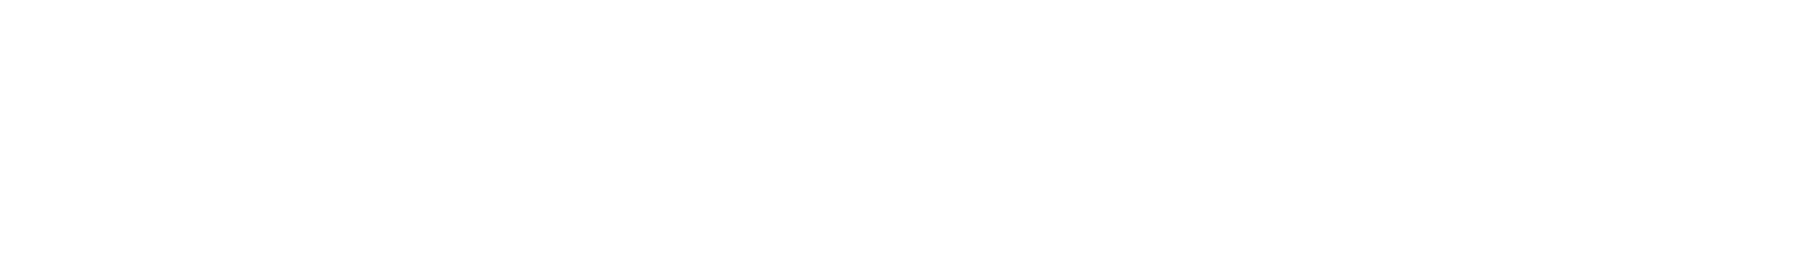 perc 1 12